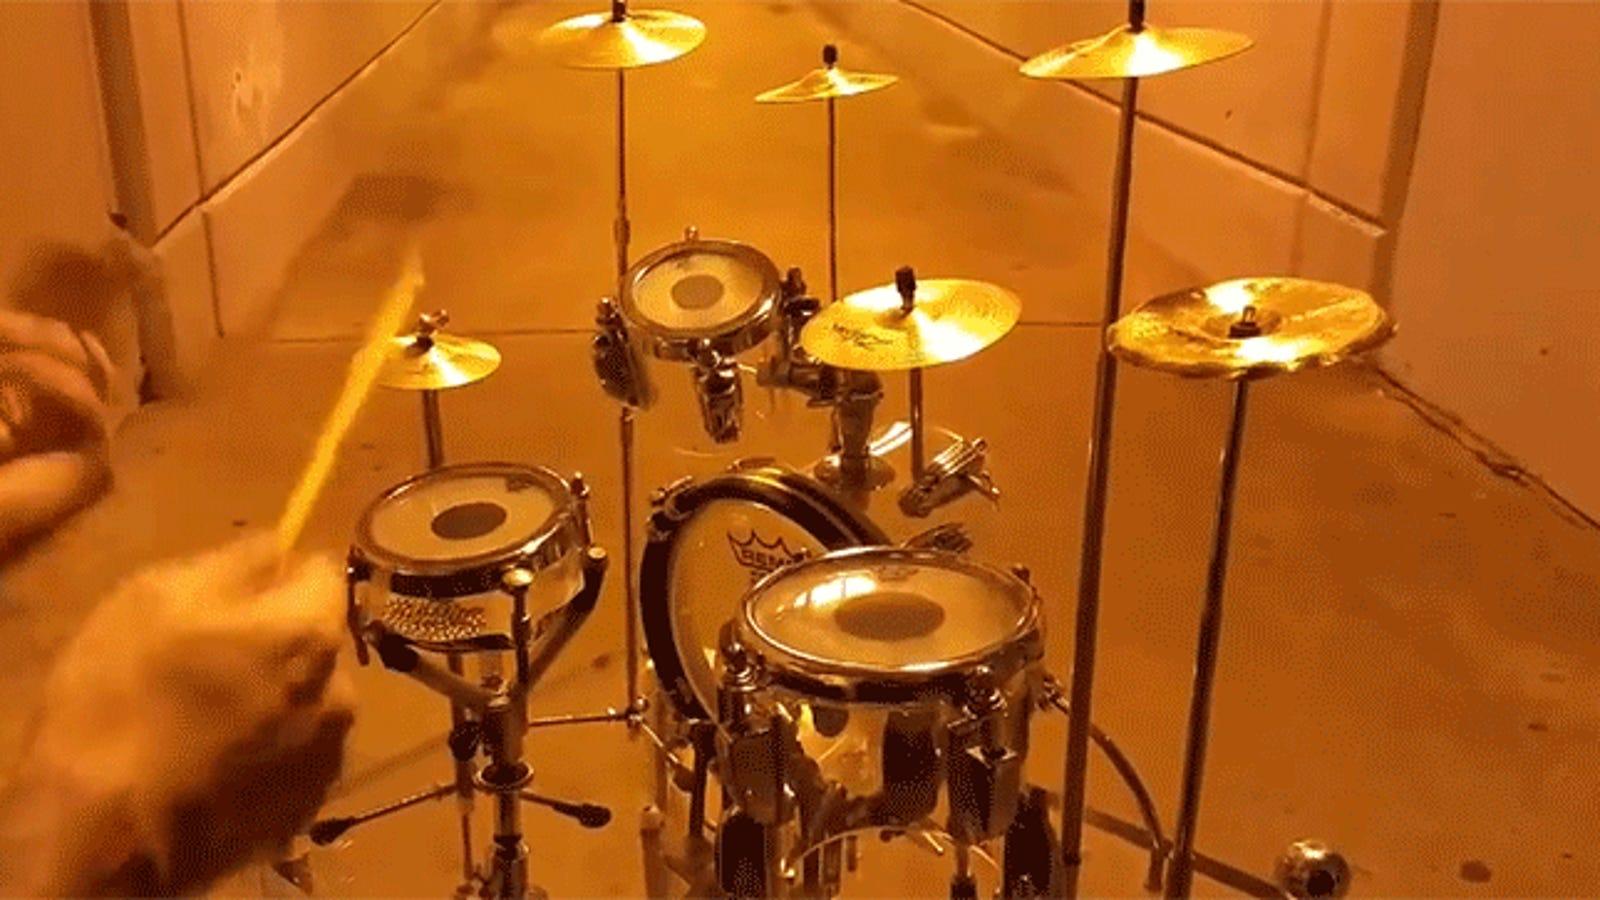 This Tiny Drum Set Sounds Amazingly Good